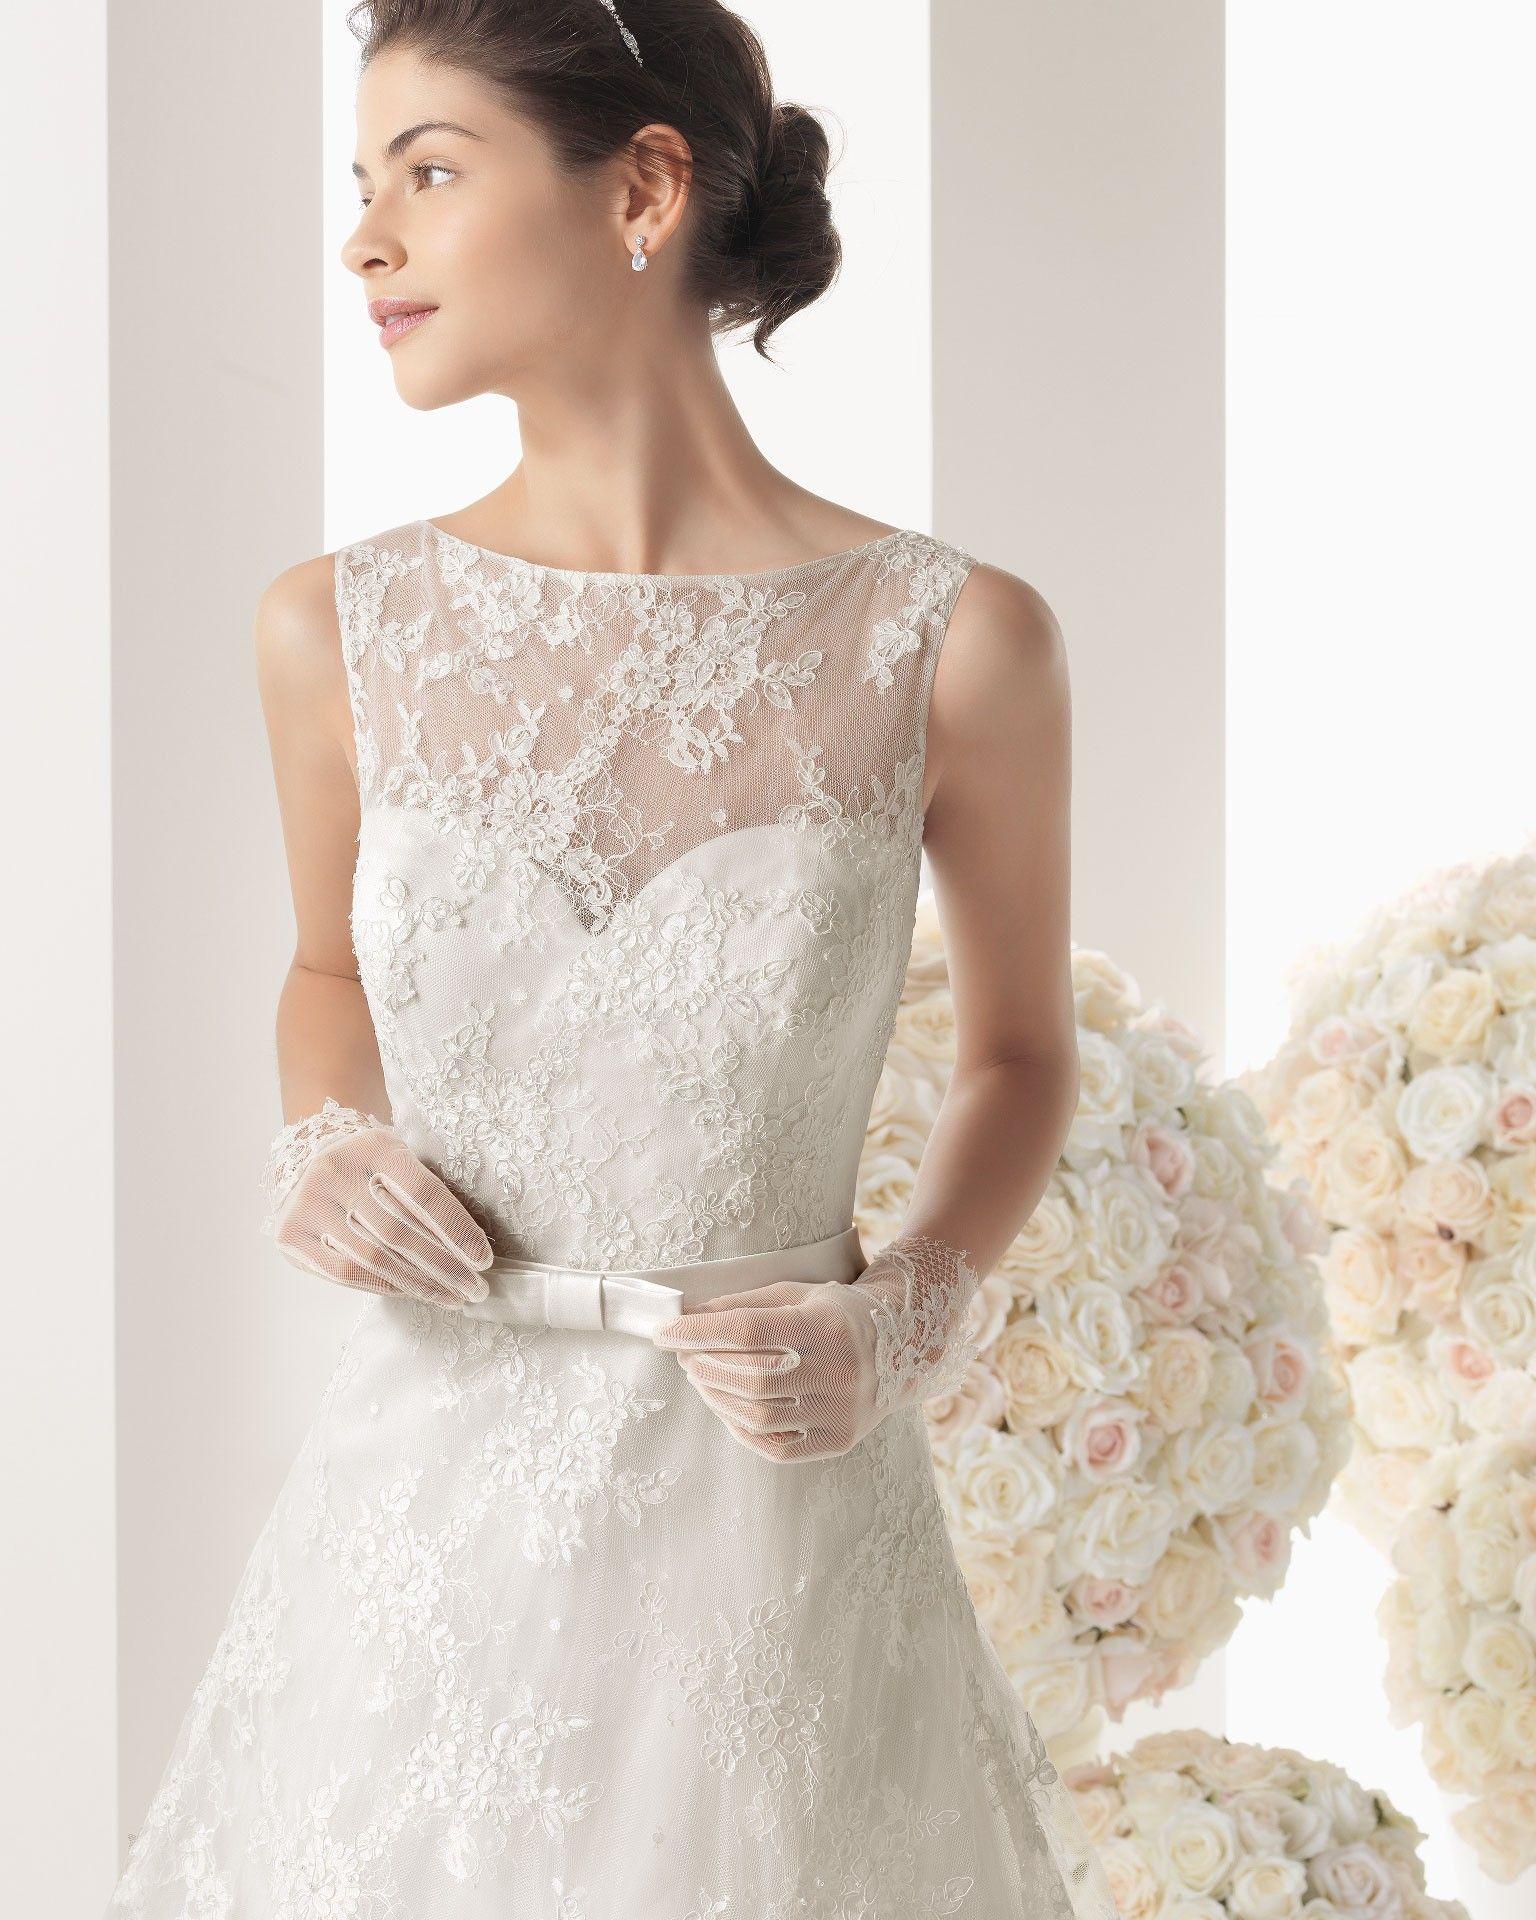 lace top wedding dress Noble line tank top lace ivory brush train wedding dress hrc